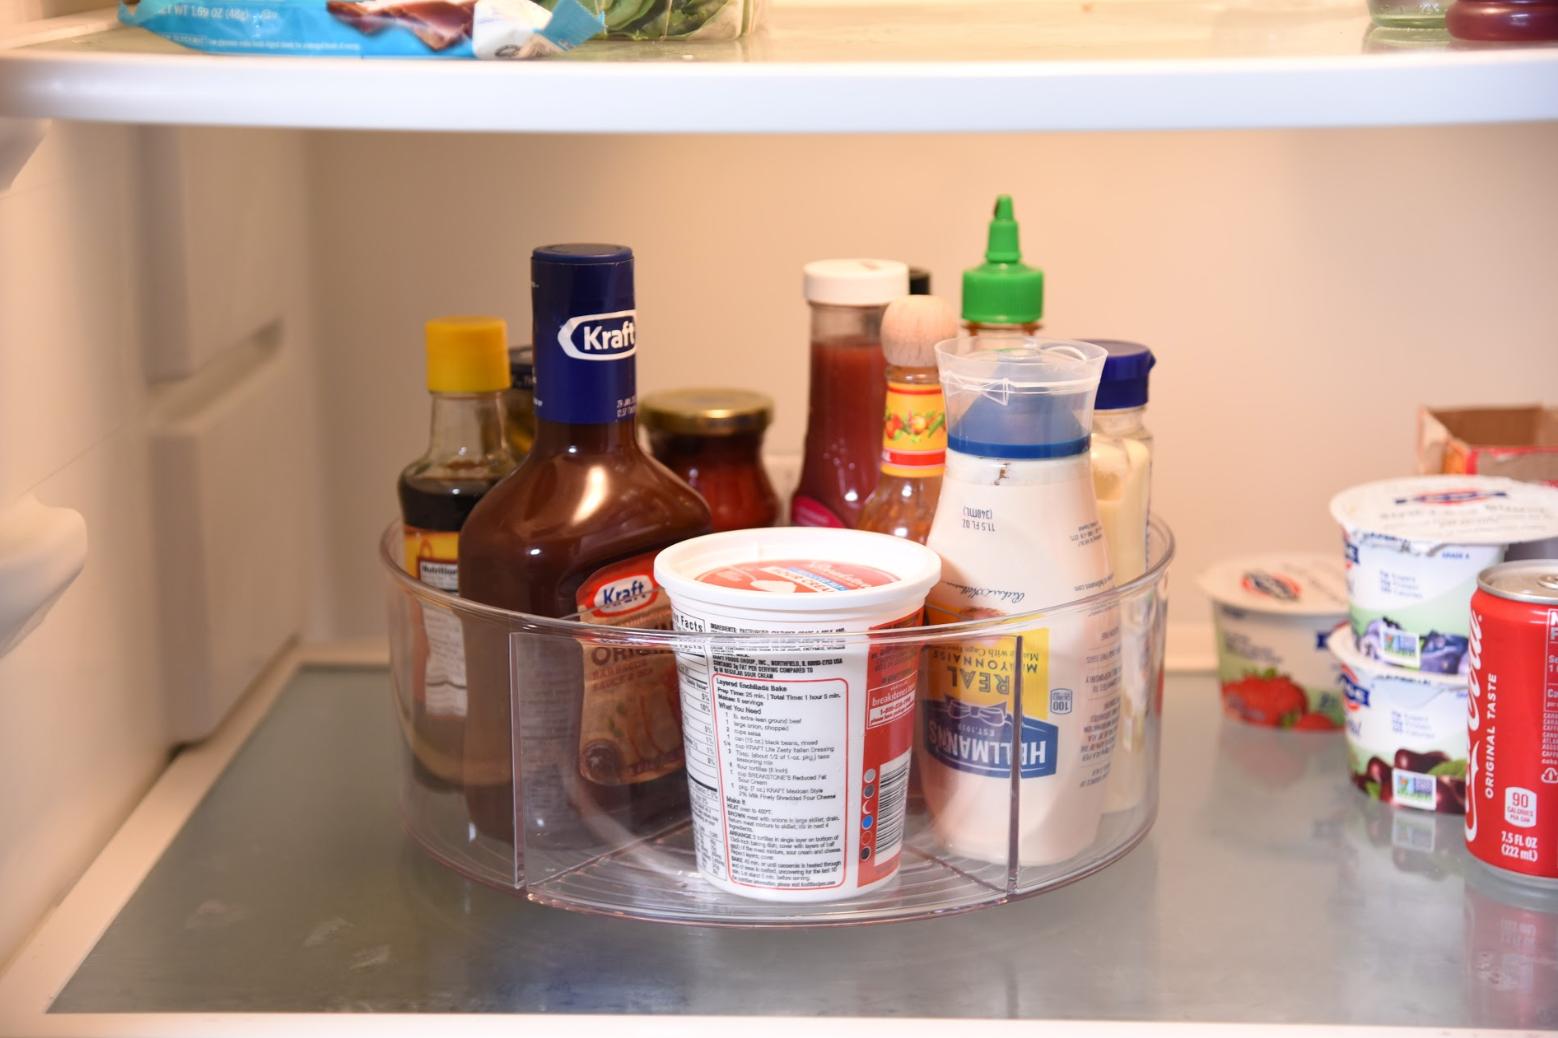 refrigerator condiments in a lazy susan